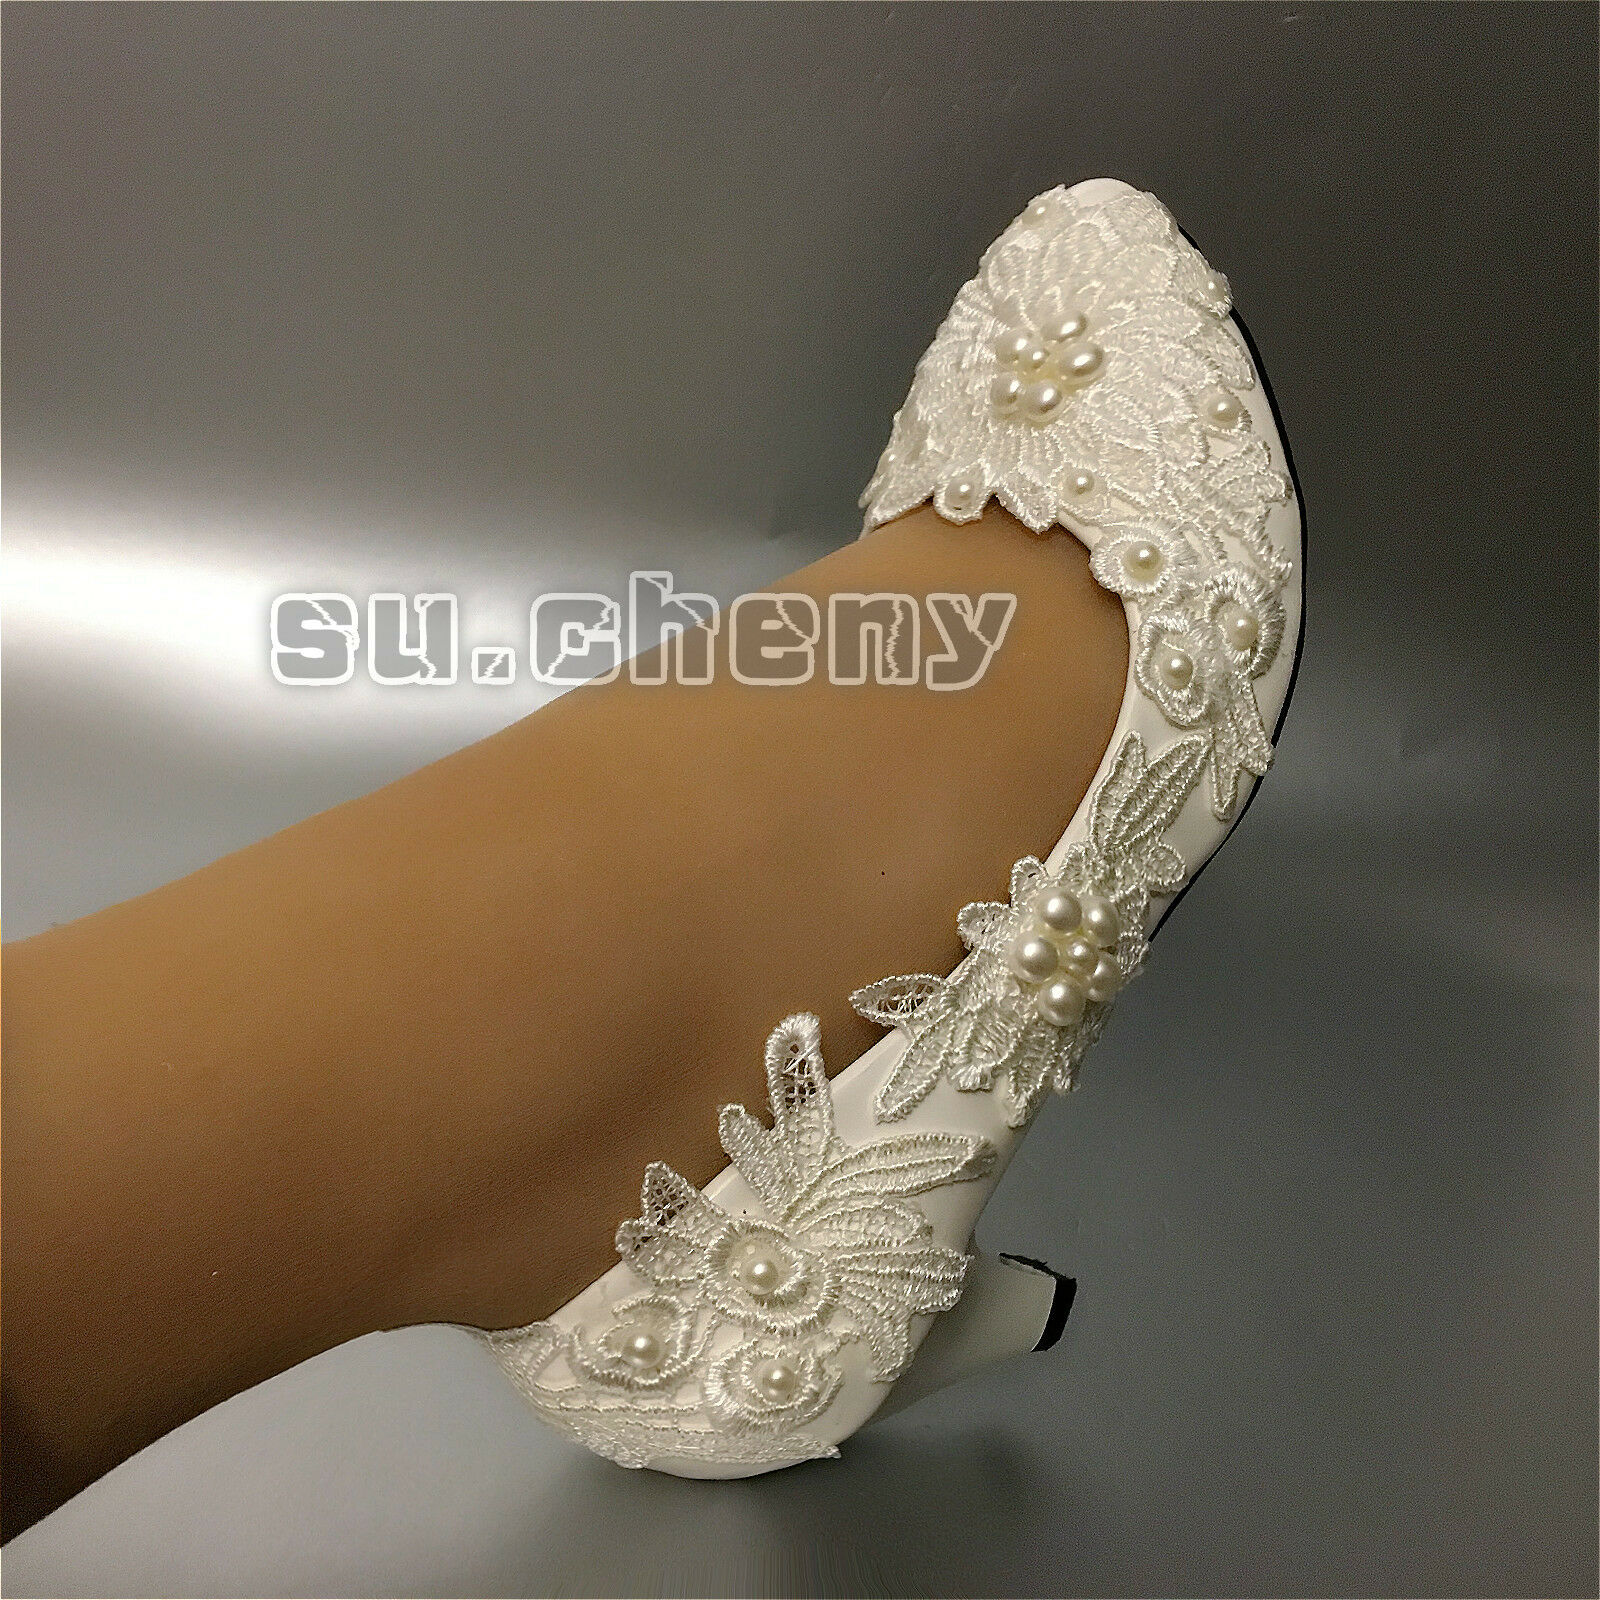 a4040fd1e71 Обувь для свадьбы su.cheny Flat 4cm 7.5cm heel white ivory pearls flats lace  Wedding Bridal shoes - 231564176725 - купить на eBay.com (США) с доставкой  в ...